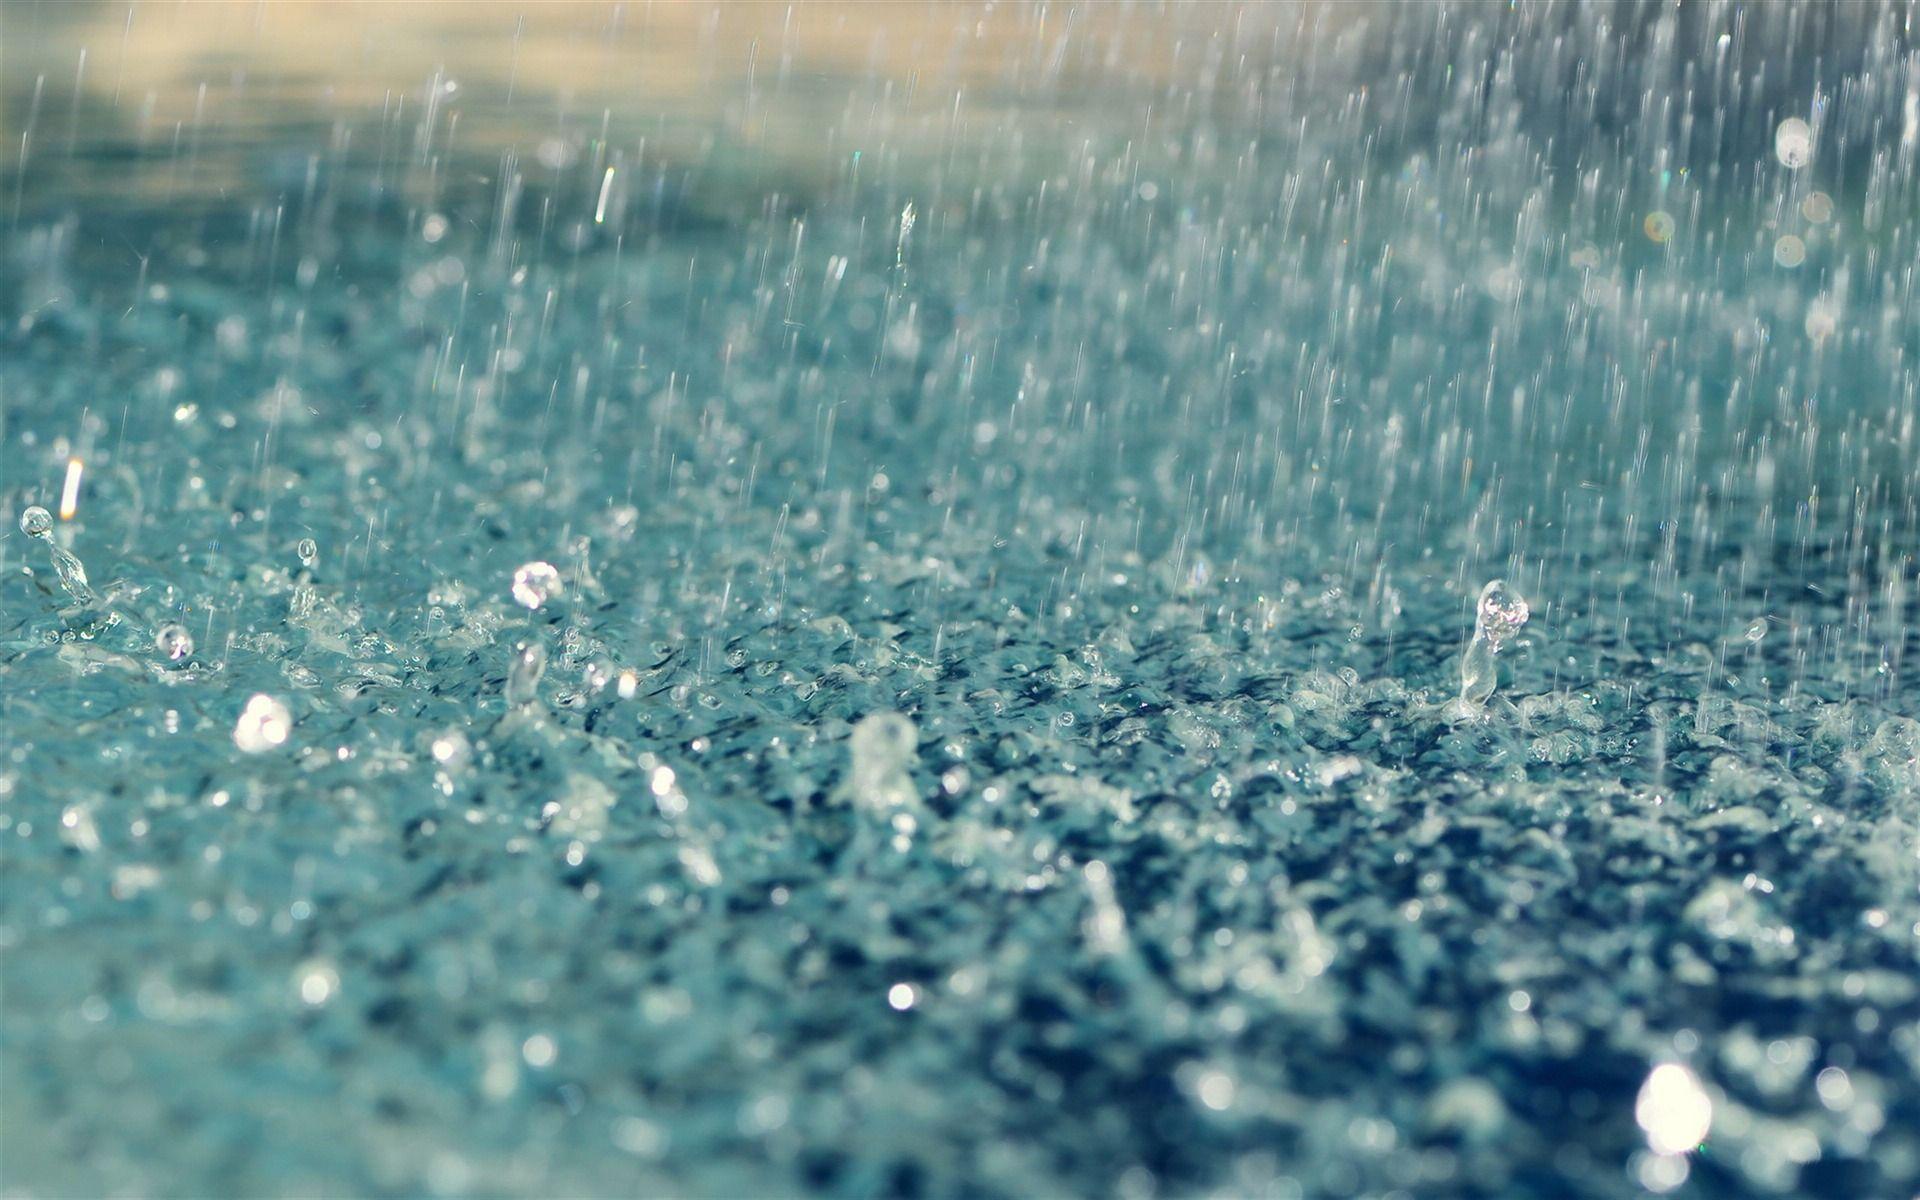 Hd wallpaper rain - Rain Drops Hd Wallpapers Rain Pinterest